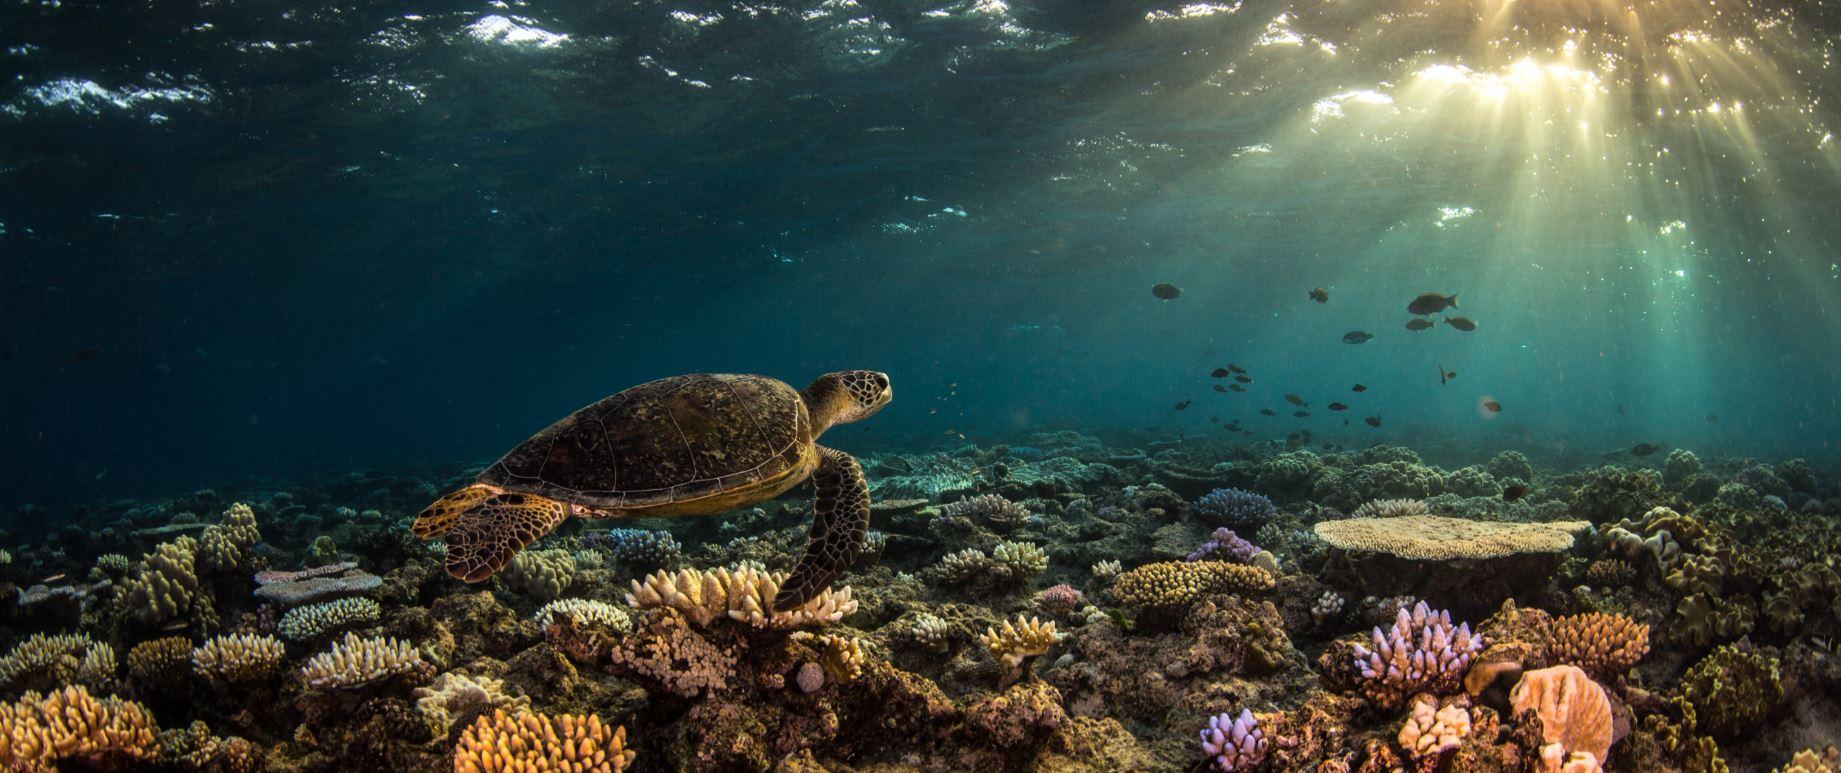 reefs day debacle - photo #13